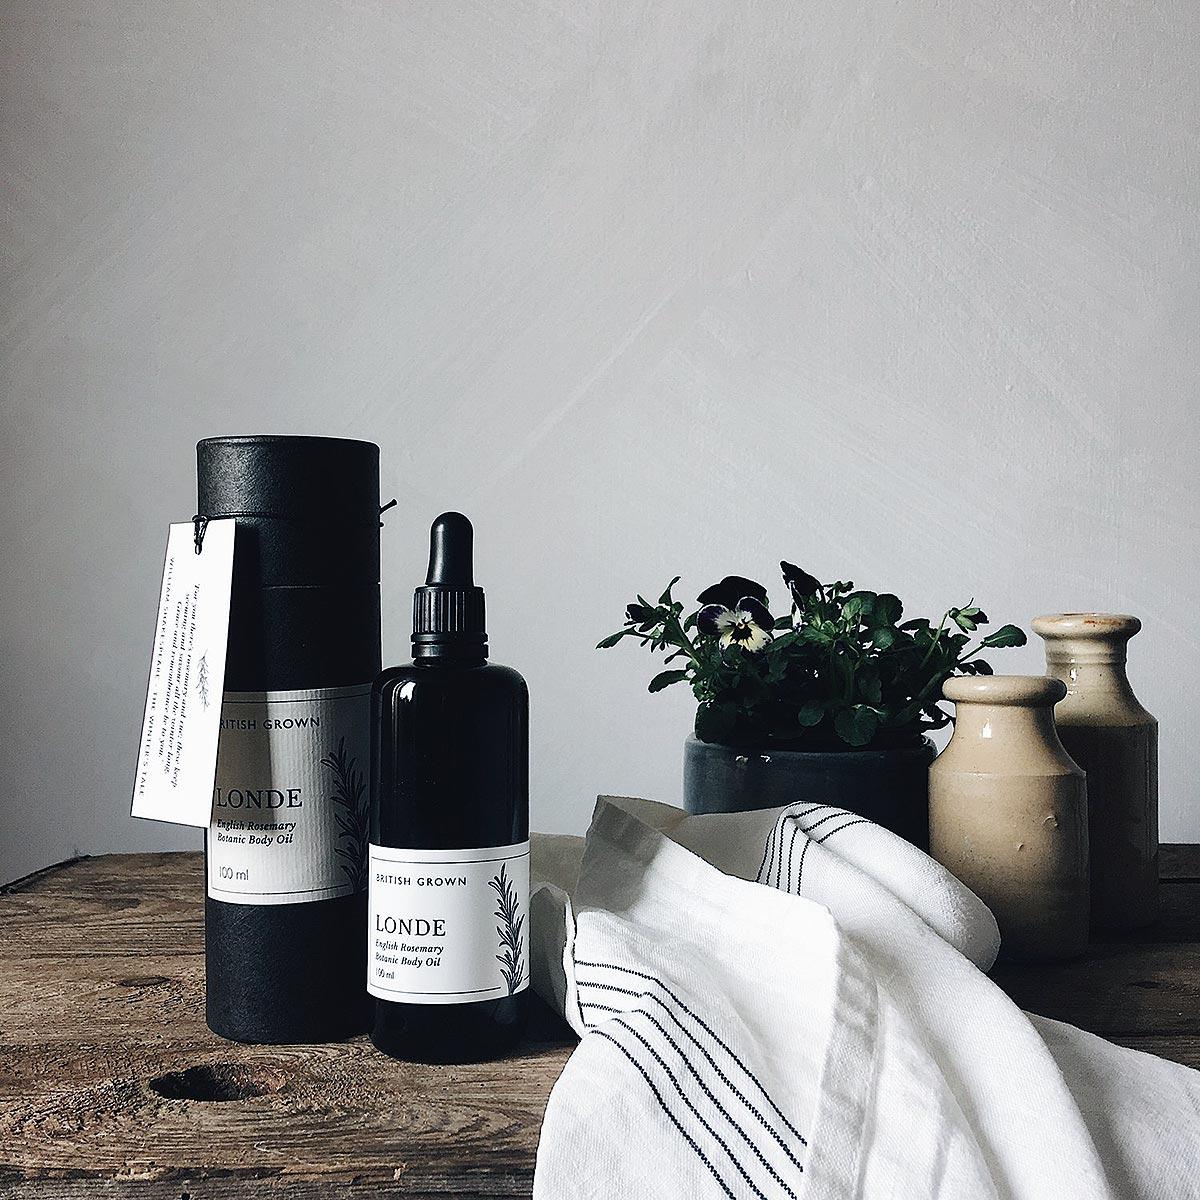 bottle packaging tea towel jars and plantnd